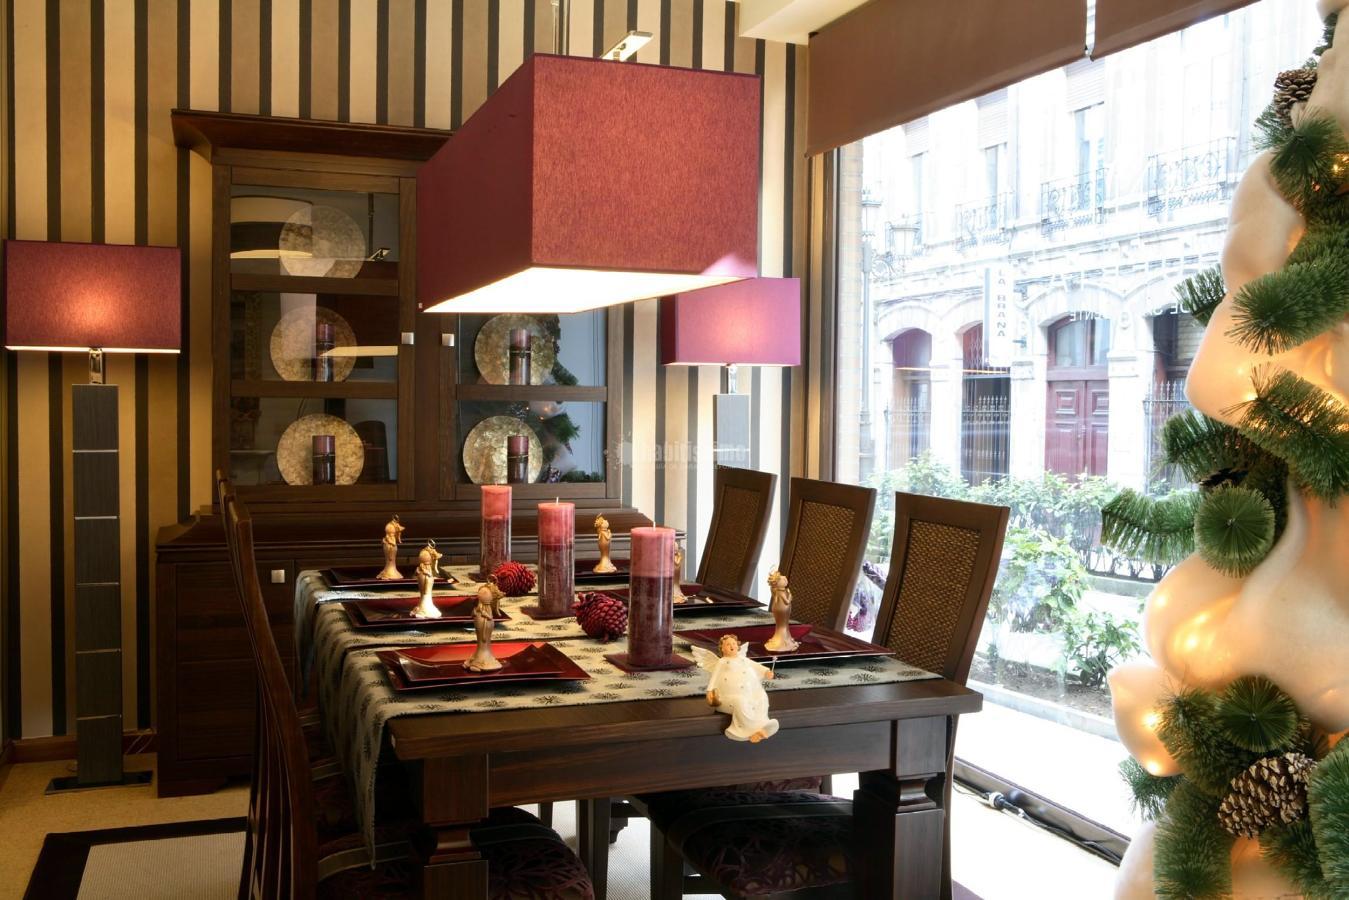 Foto muebles art culos decoraci n decoraci n de huerta de san vicente 21487 habitissimo - Muebles san vicente ...